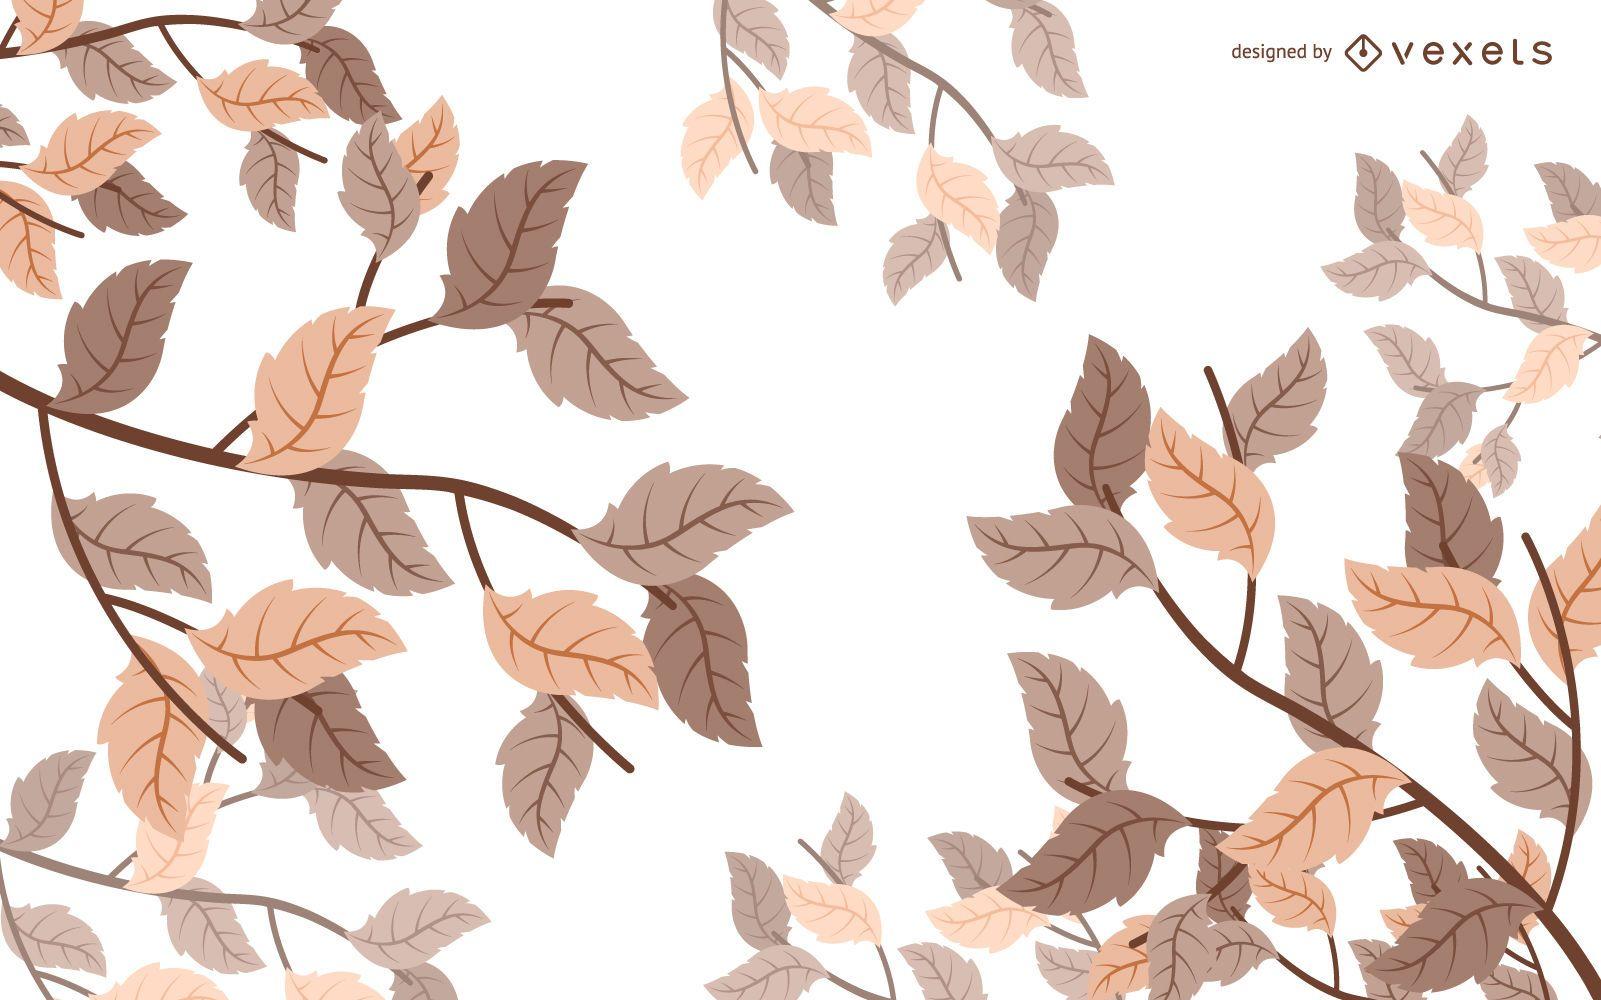 Illustrated autumn leaves background